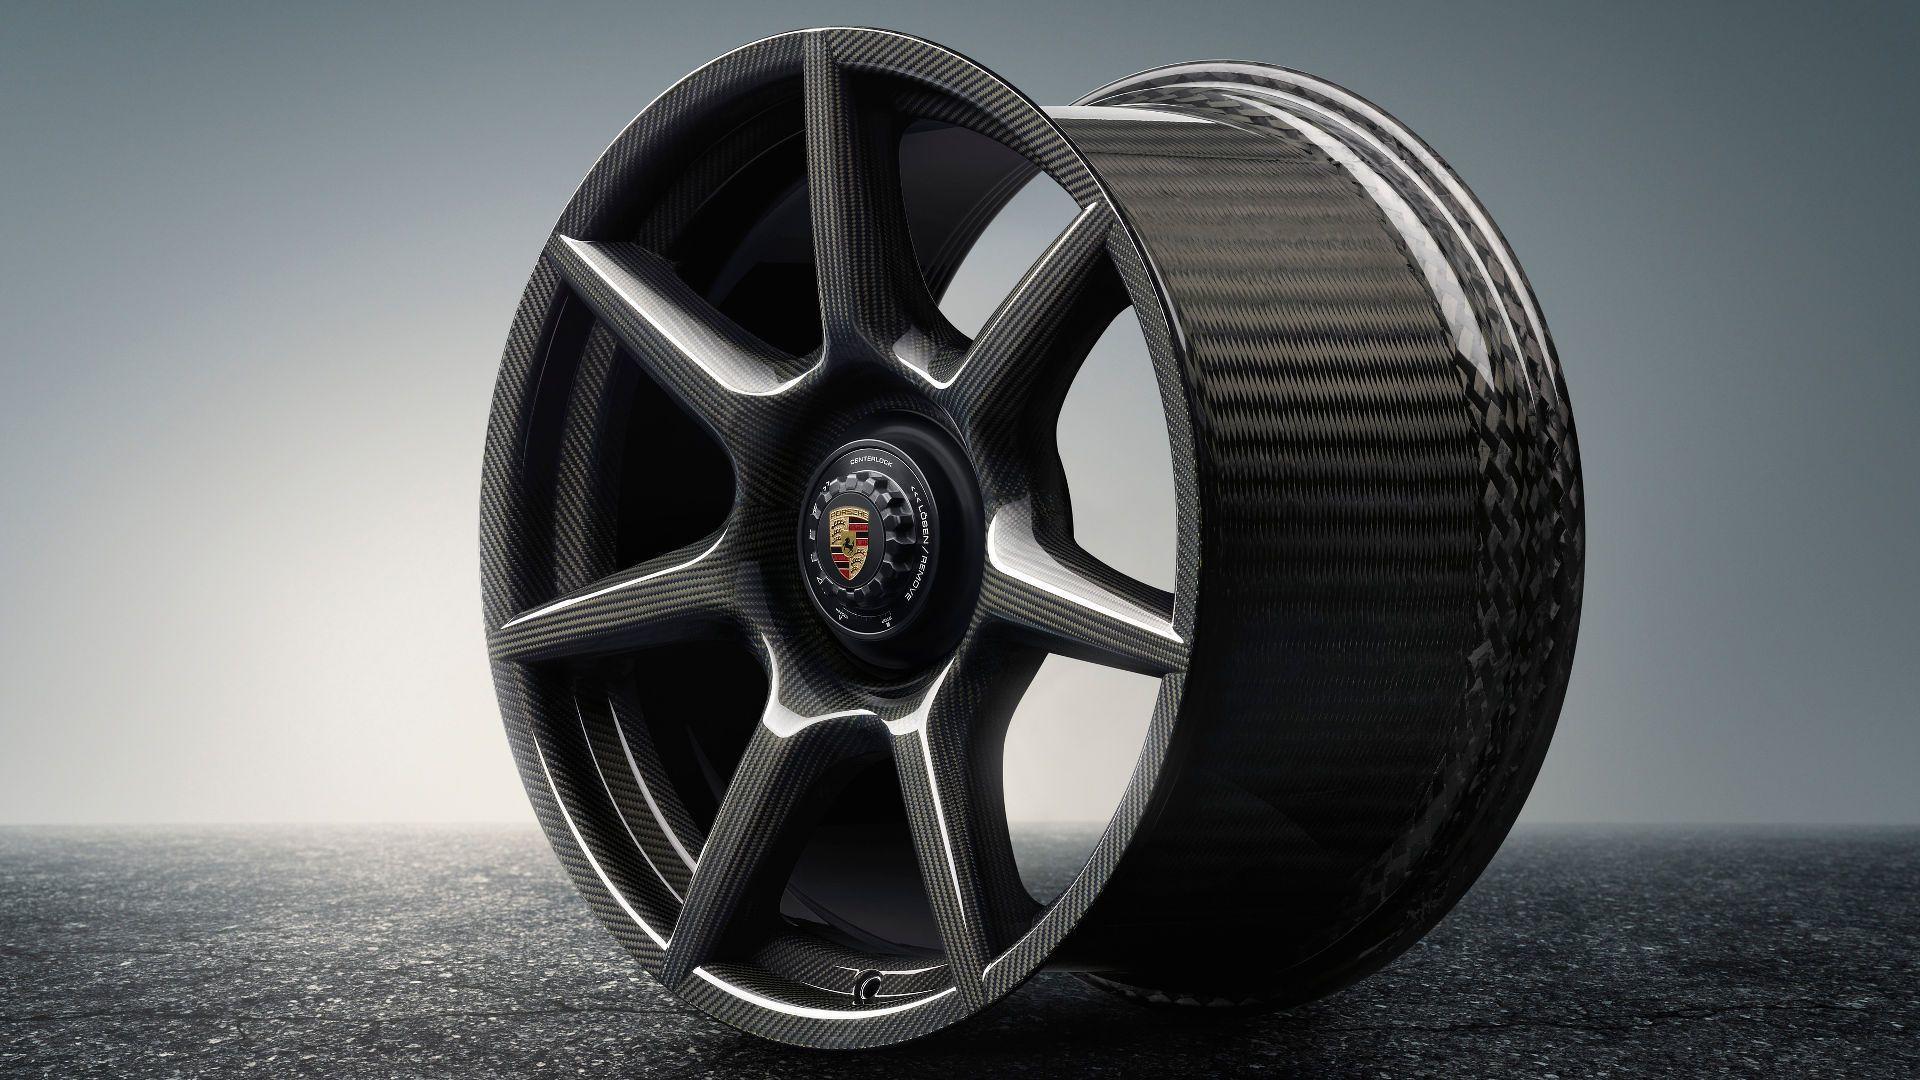 Photo of Οι κάρμπον ζάντες της νέας Porsche 911 Turbo Exclusive κοστίζουν όσο ένα «φιεστάκι»! [vid]